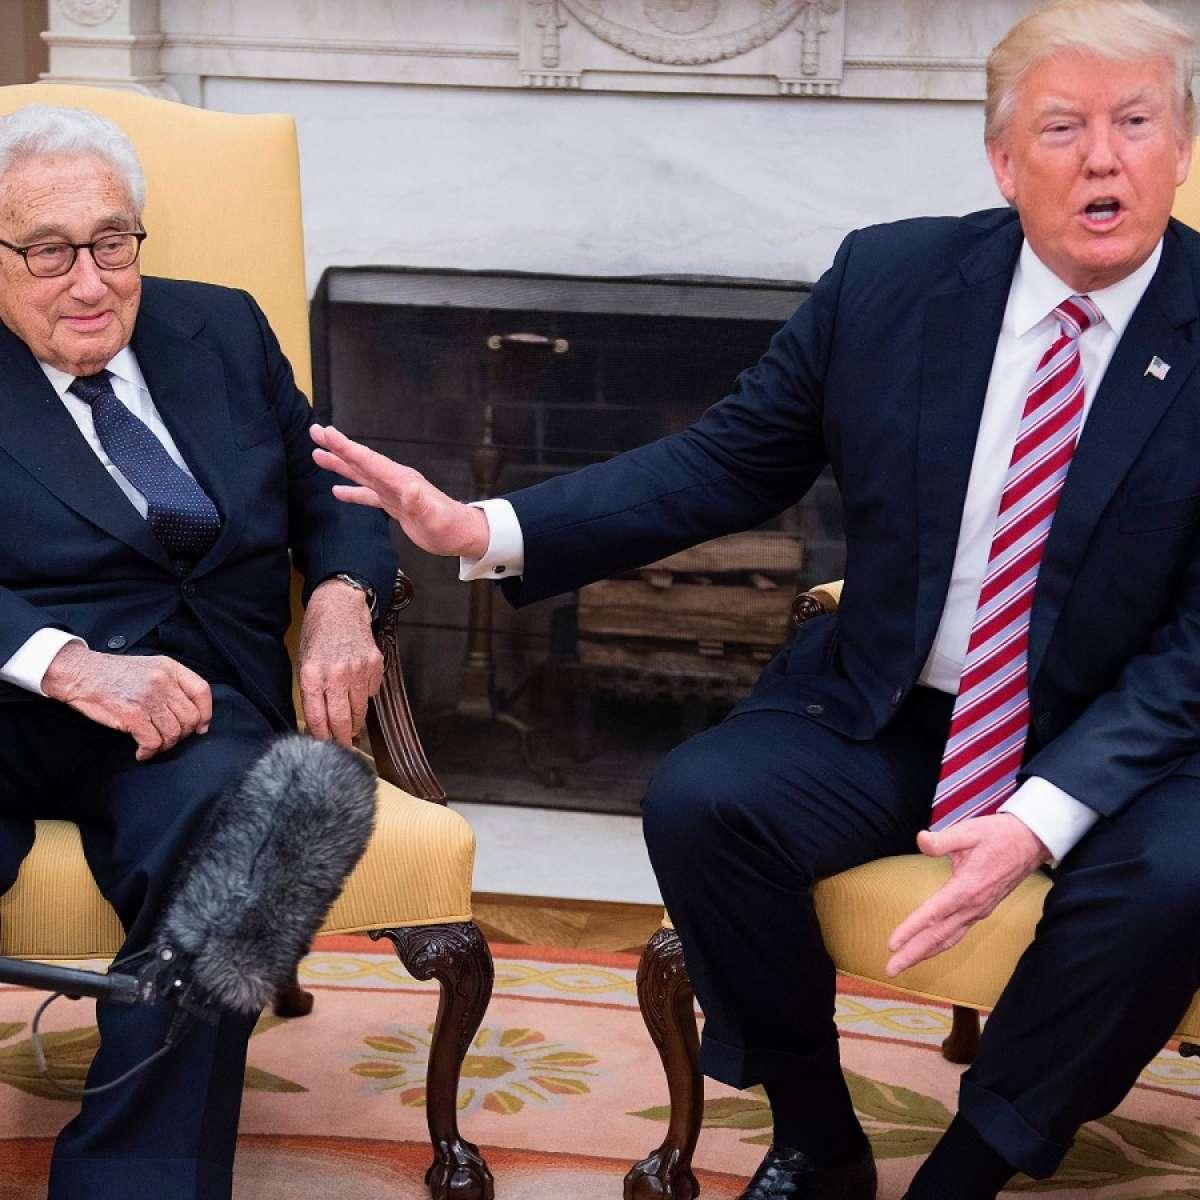 Эпоха Киссинджера закончилась